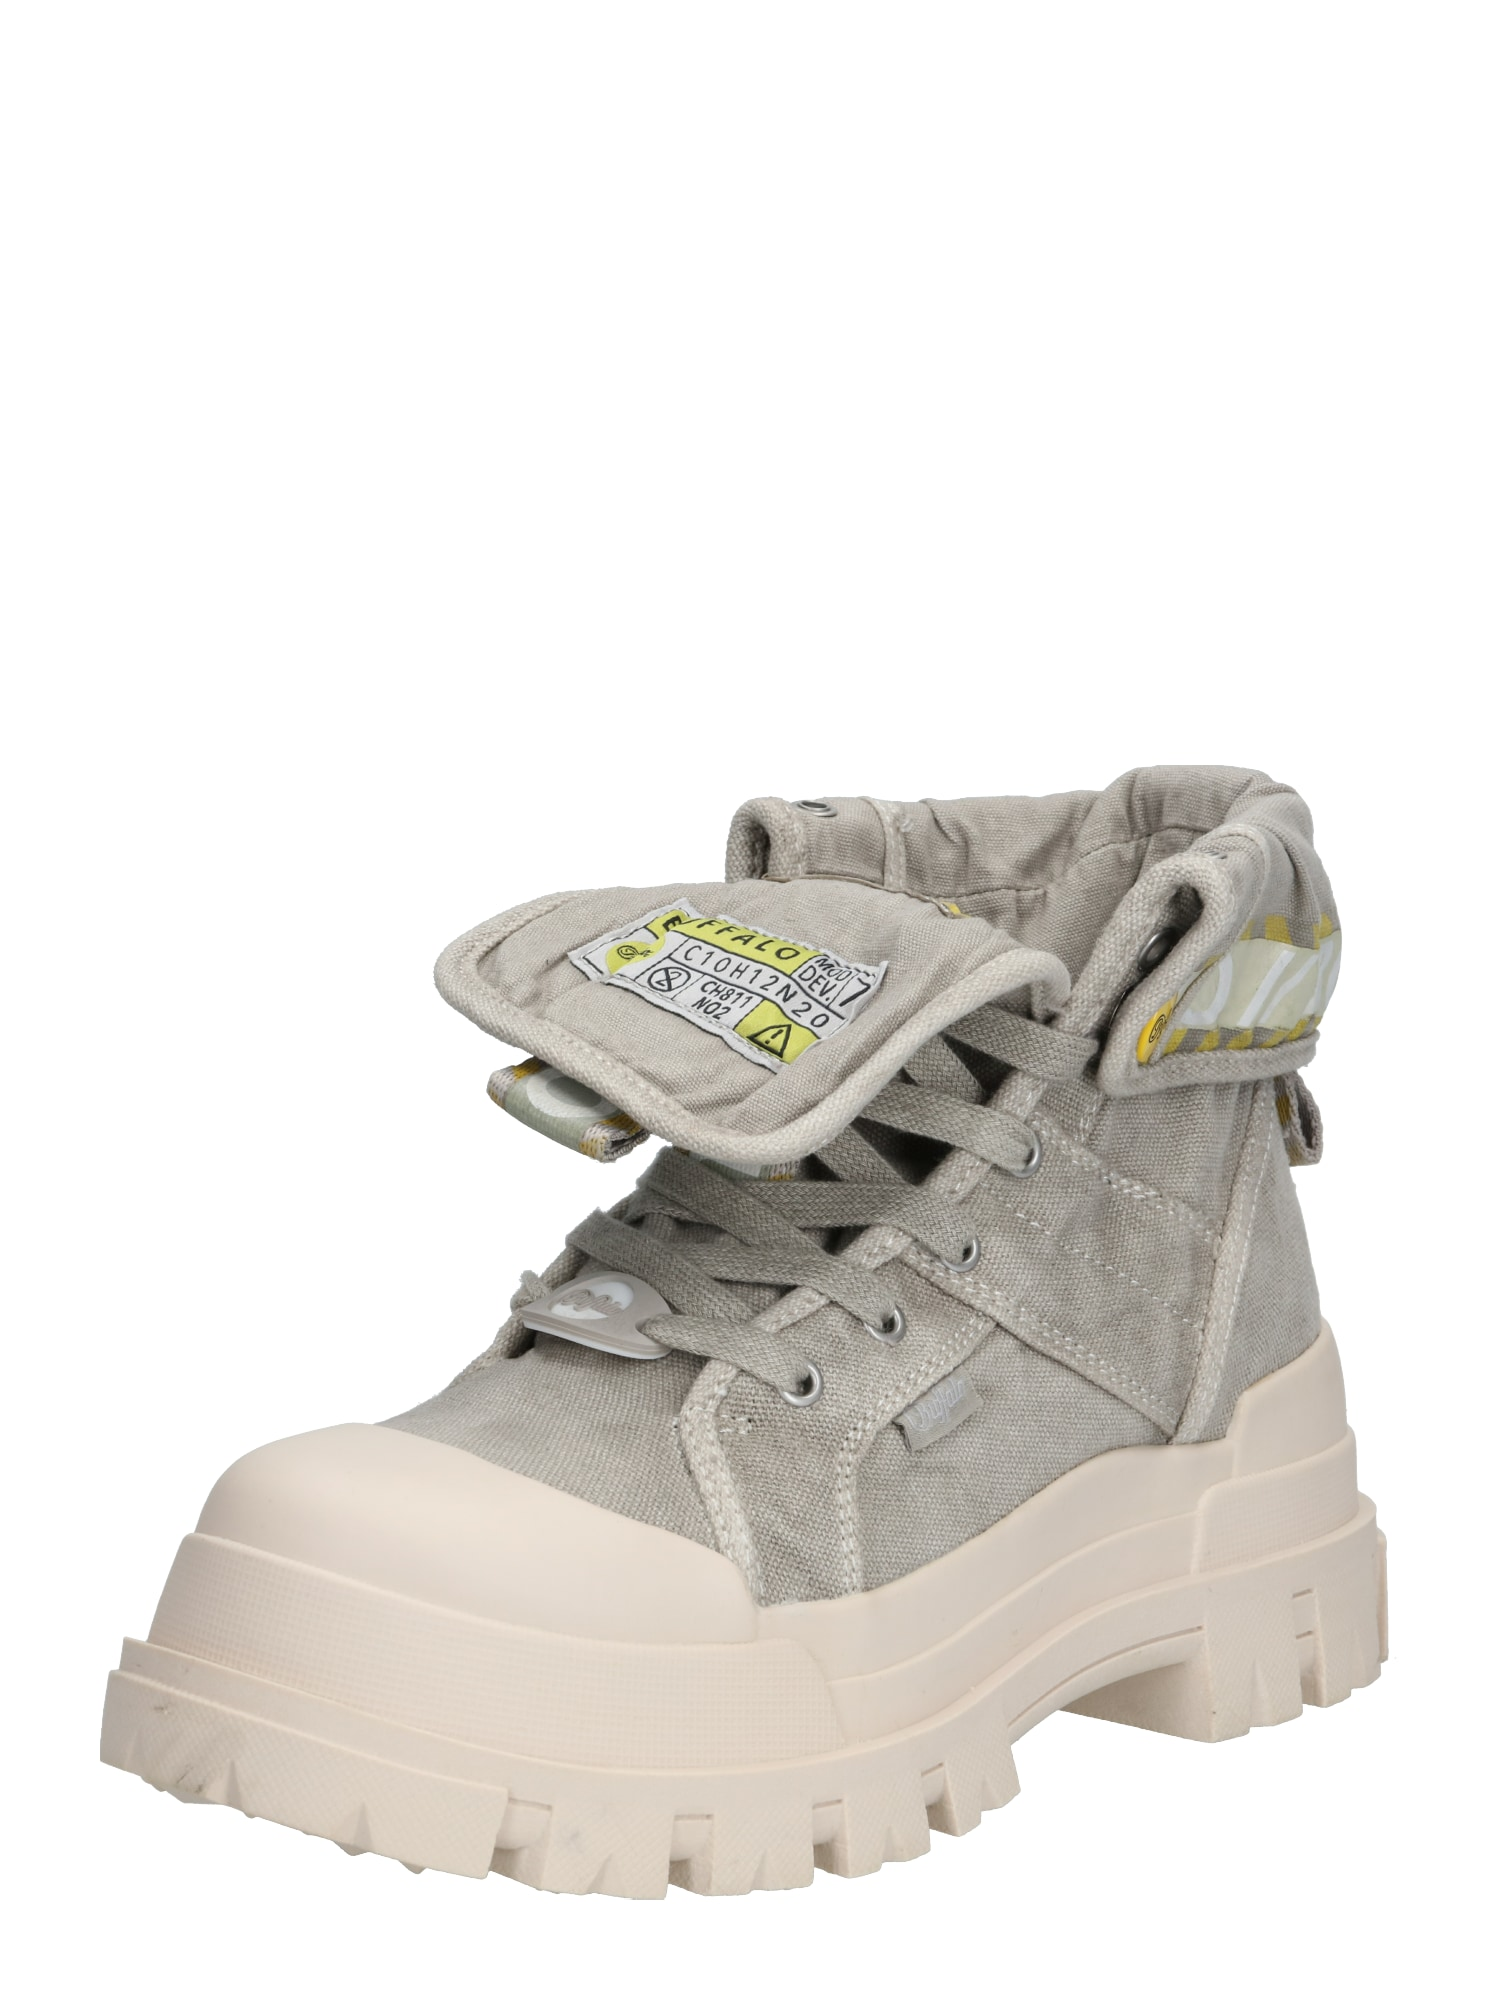 BUFFALO Auliniai batai su kulniuku 'ASPHA HI' balta / akmens